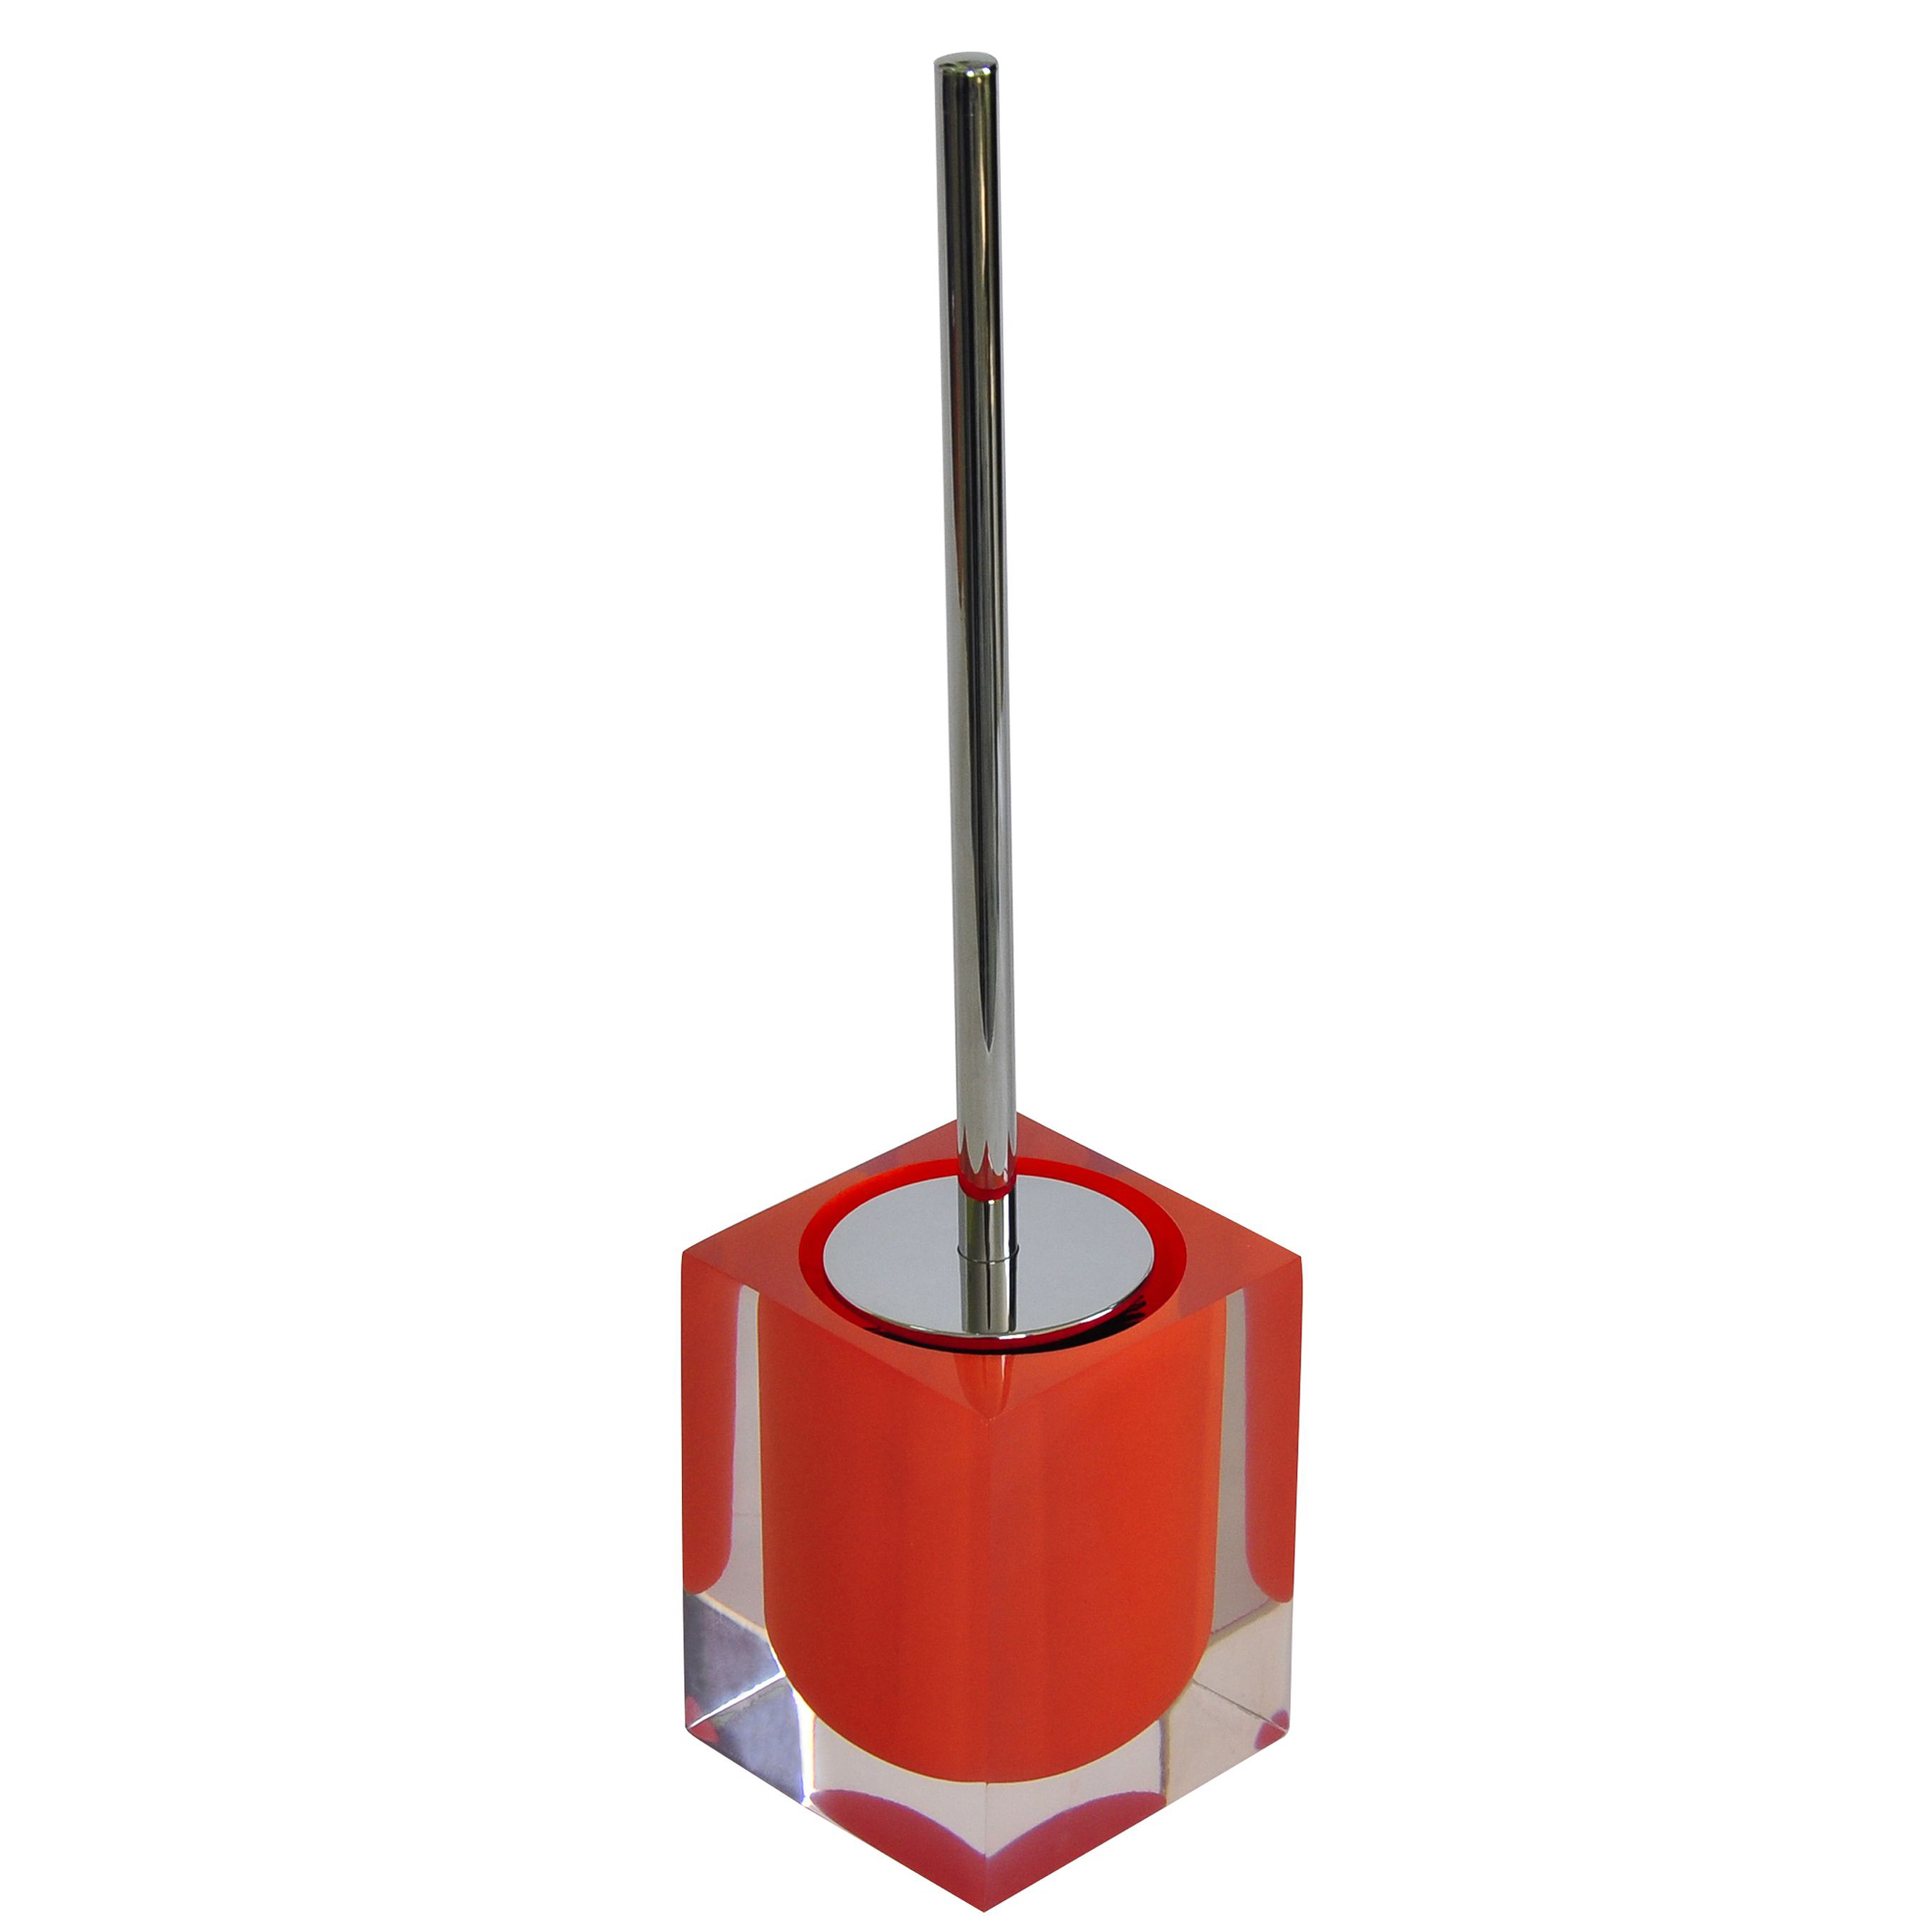 Ёрш для унитаза Colours оранжевый Ridder ершик для унитаза ridder colours 22280402 розовый